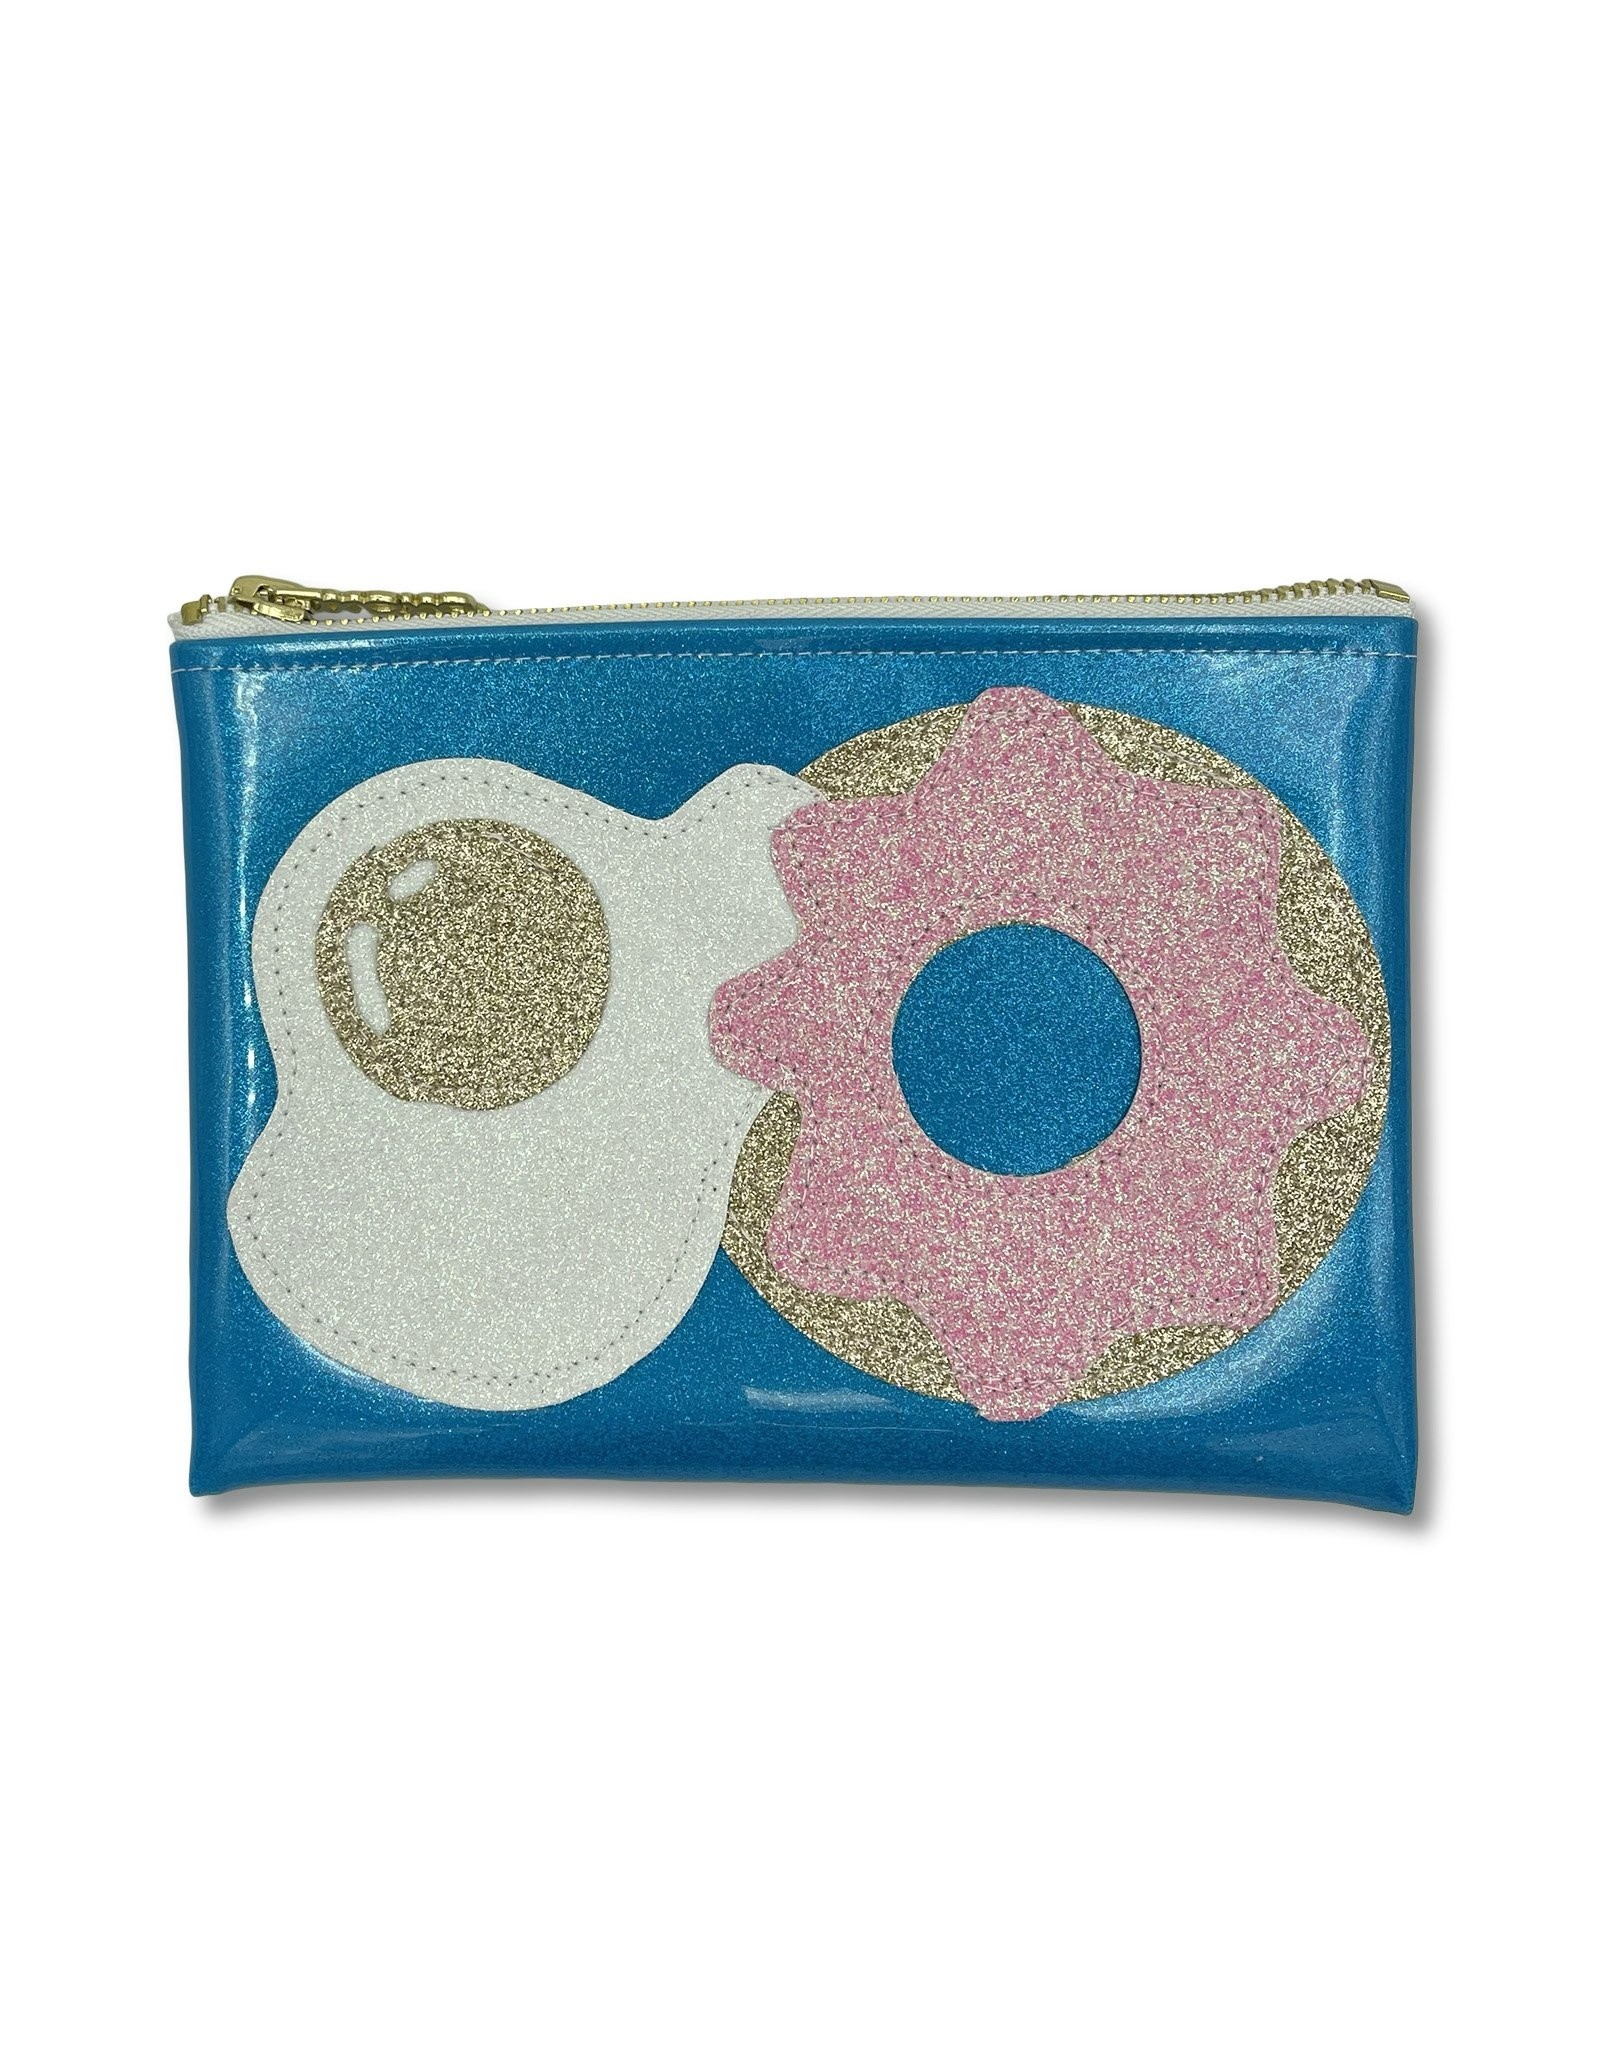 Julie Mollo Midi Clutch: The Breakfast Bag